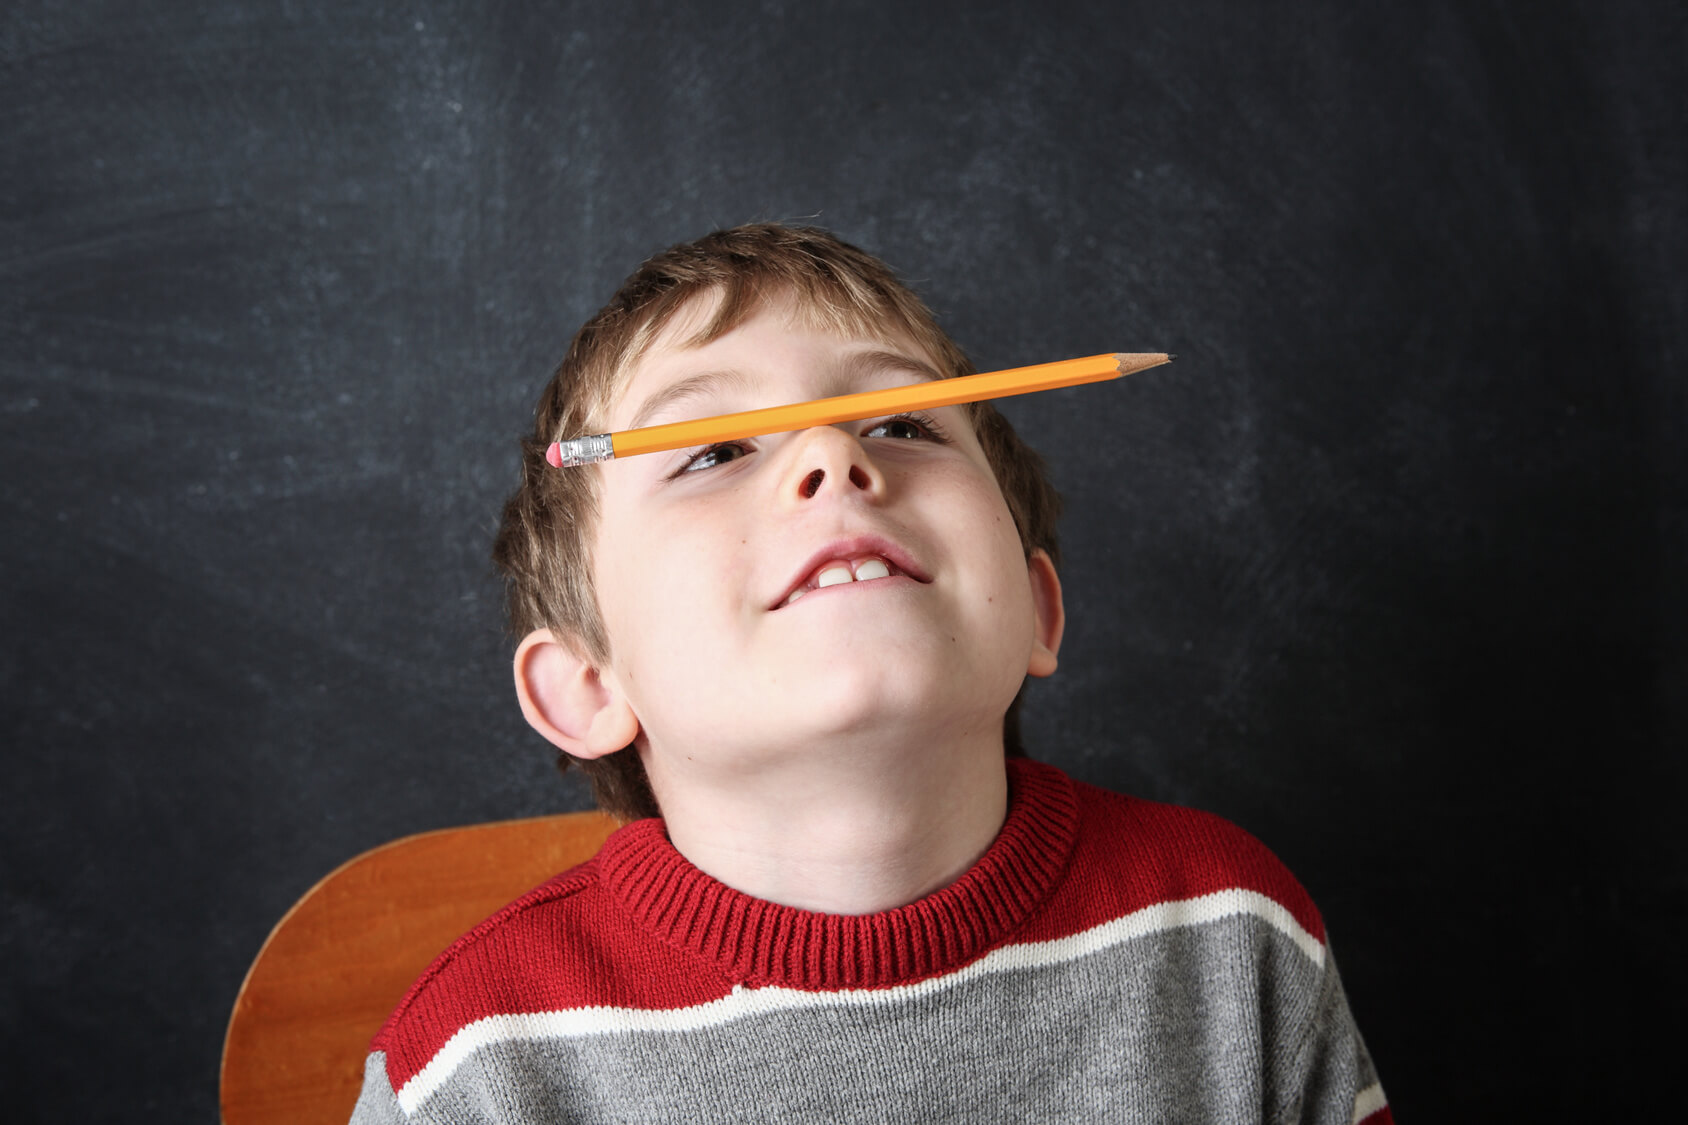 Young bored boy balancing a pencil on his nose.